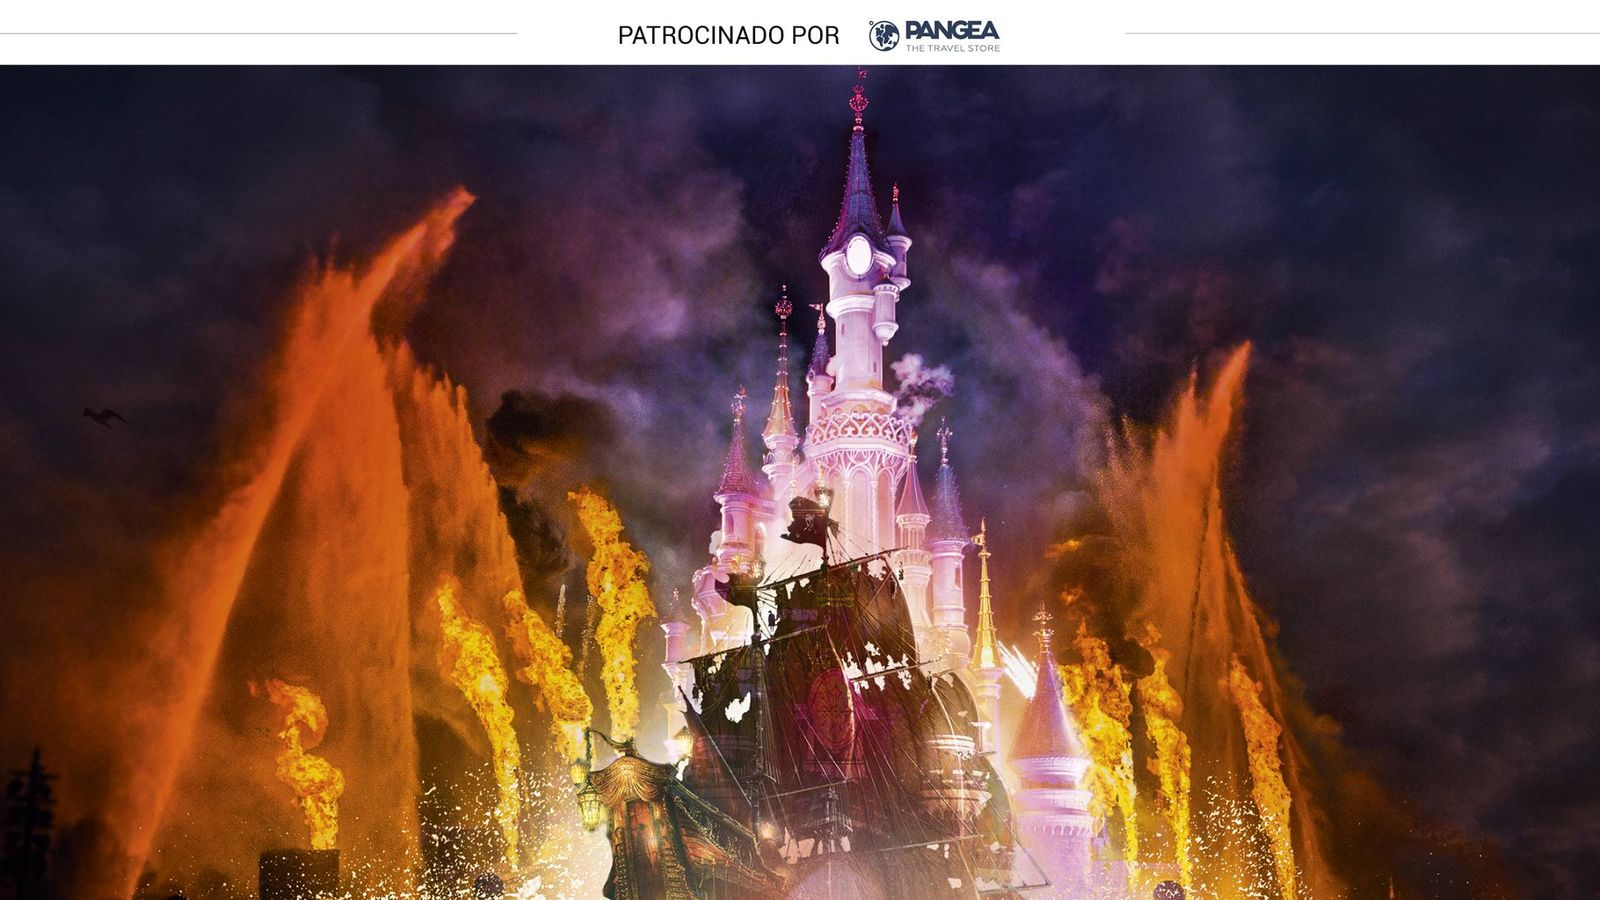 Foto: Disneyland París celebra su 25 aniversario. (Foto: Disneyland París)